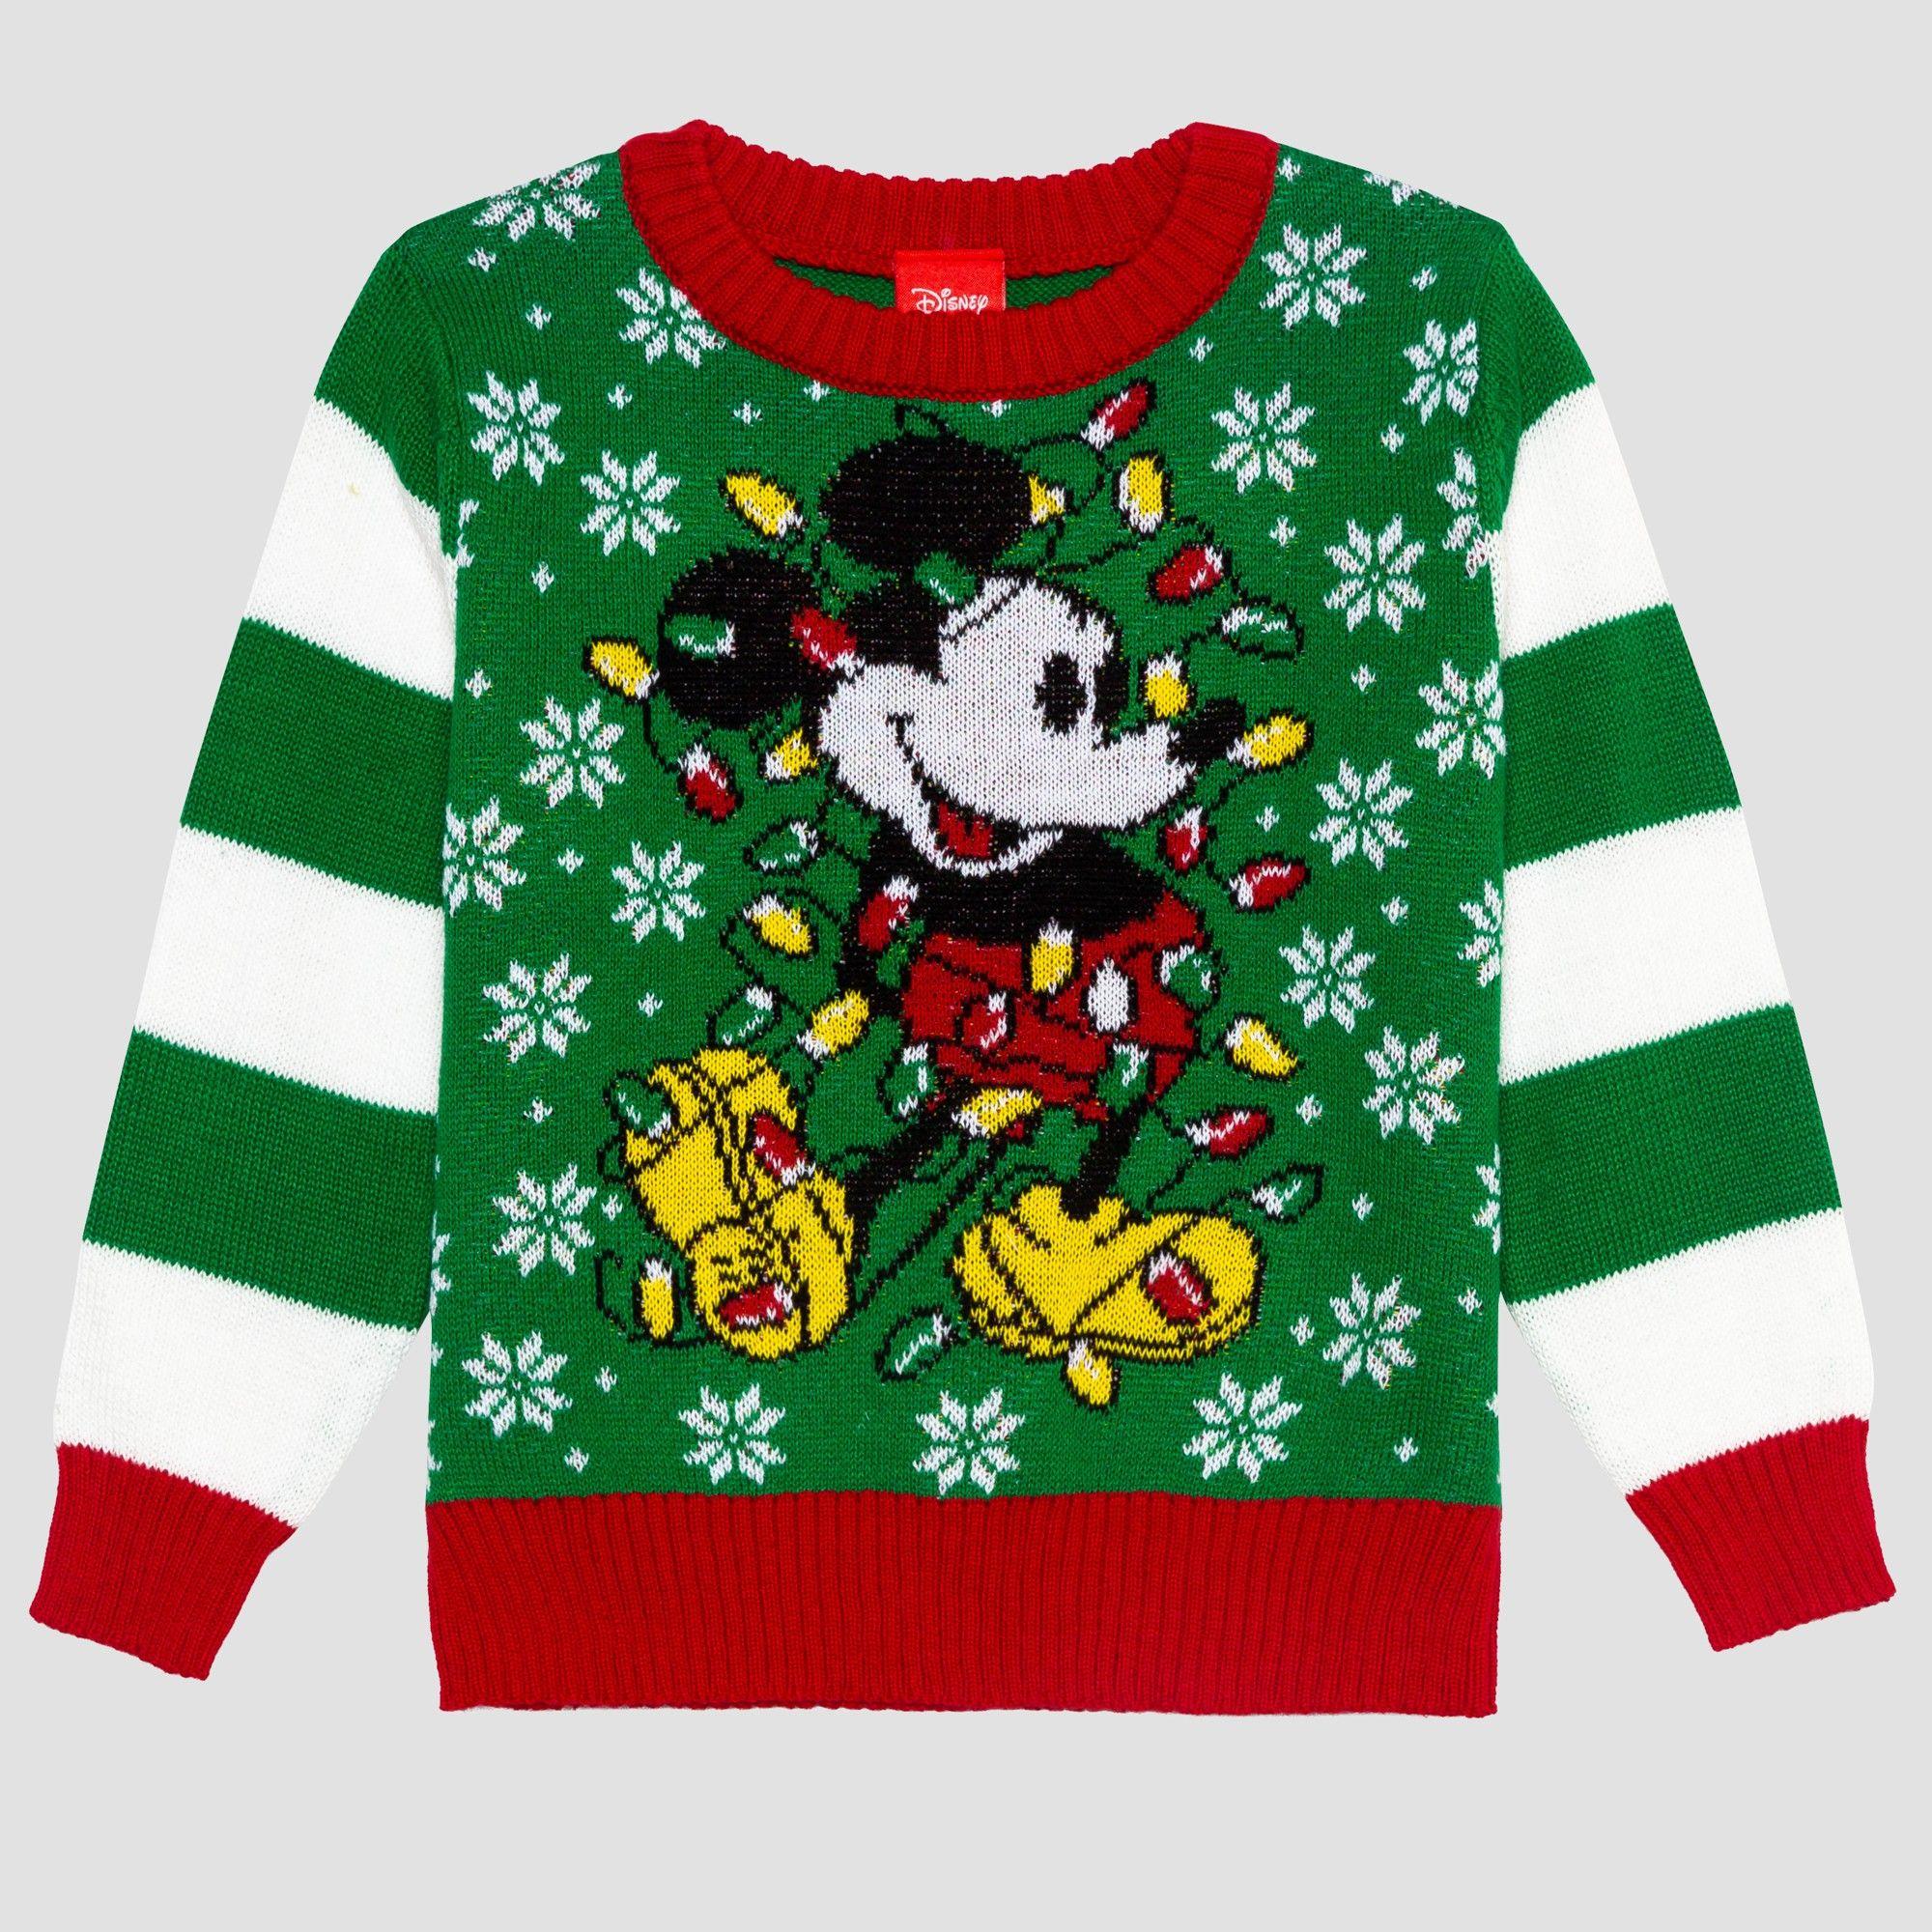 Disney Boys Ugly Christmas Sweater